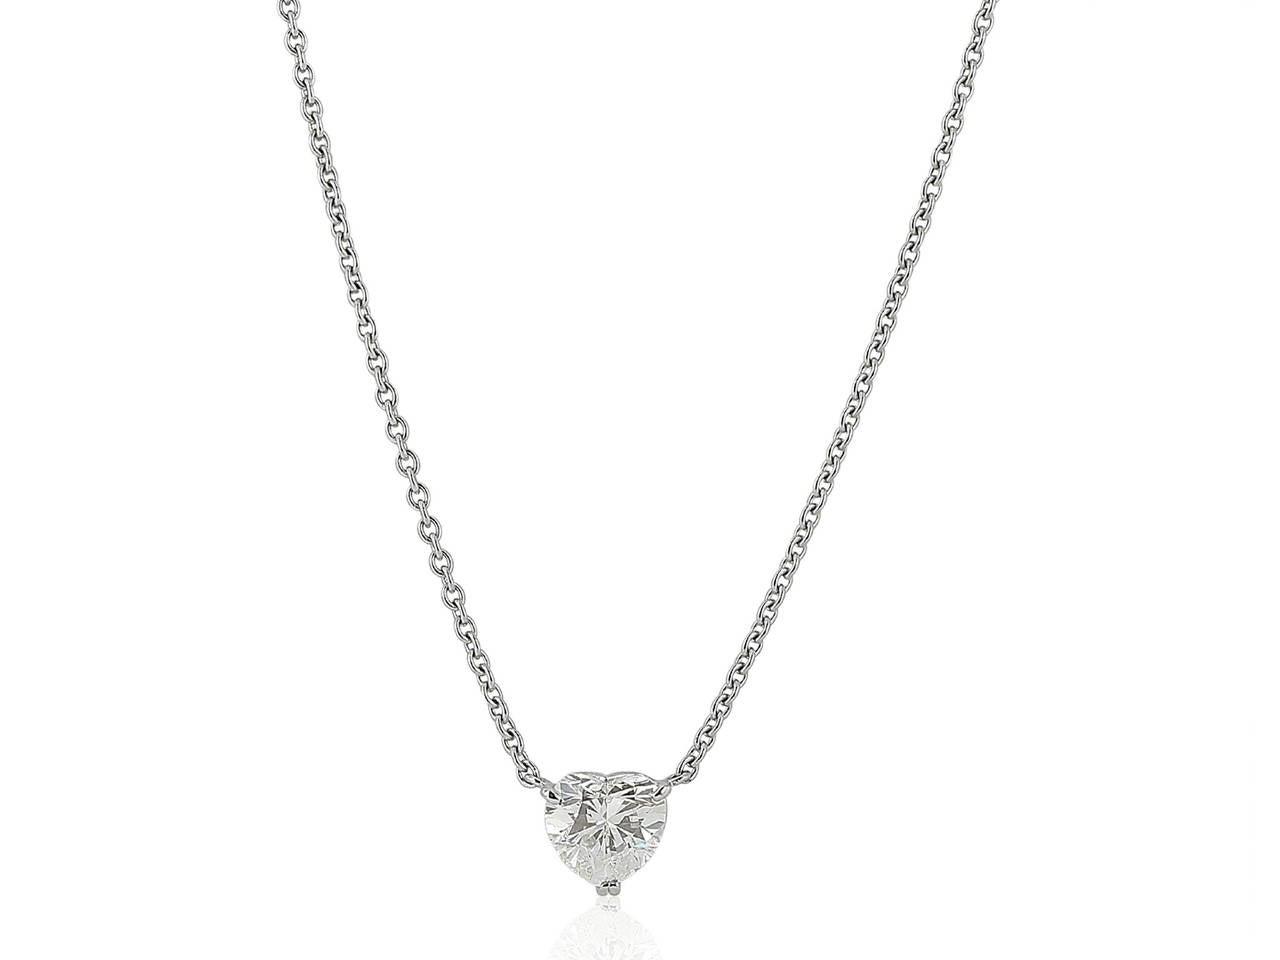 1.89 Carat Heart Diamond Platinum Pendant 2